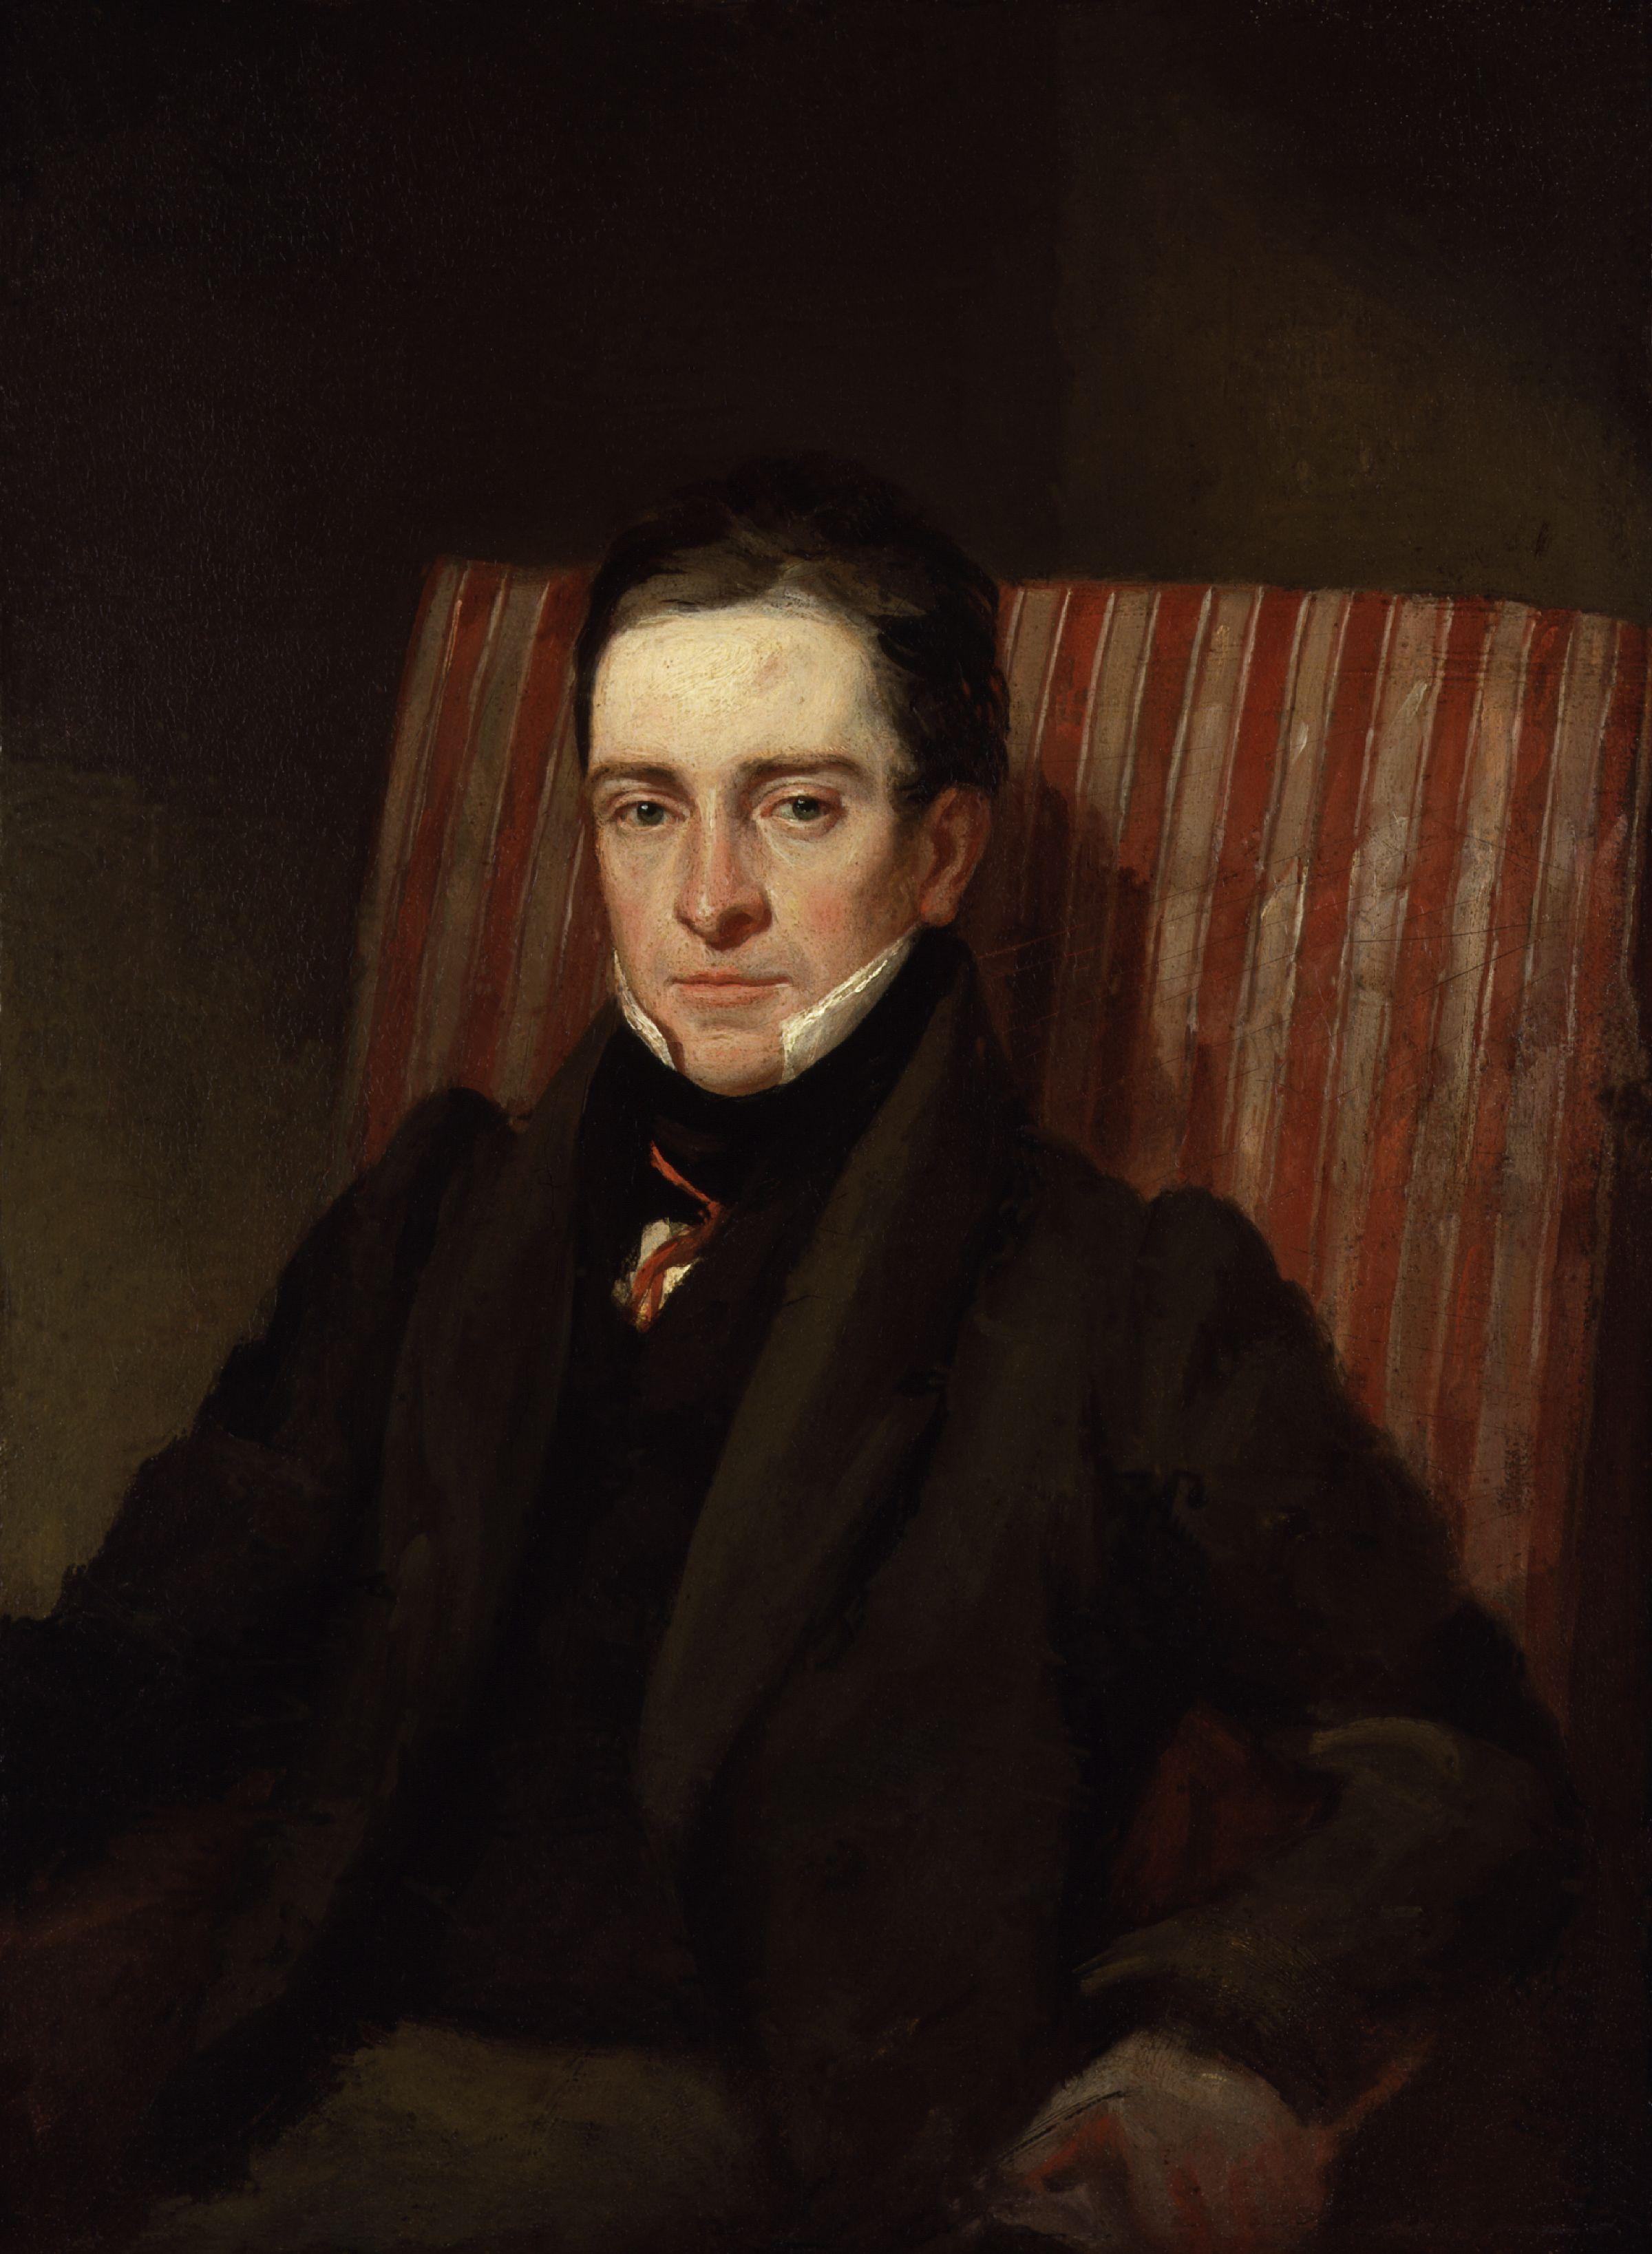 Portrait of Thomas Hood